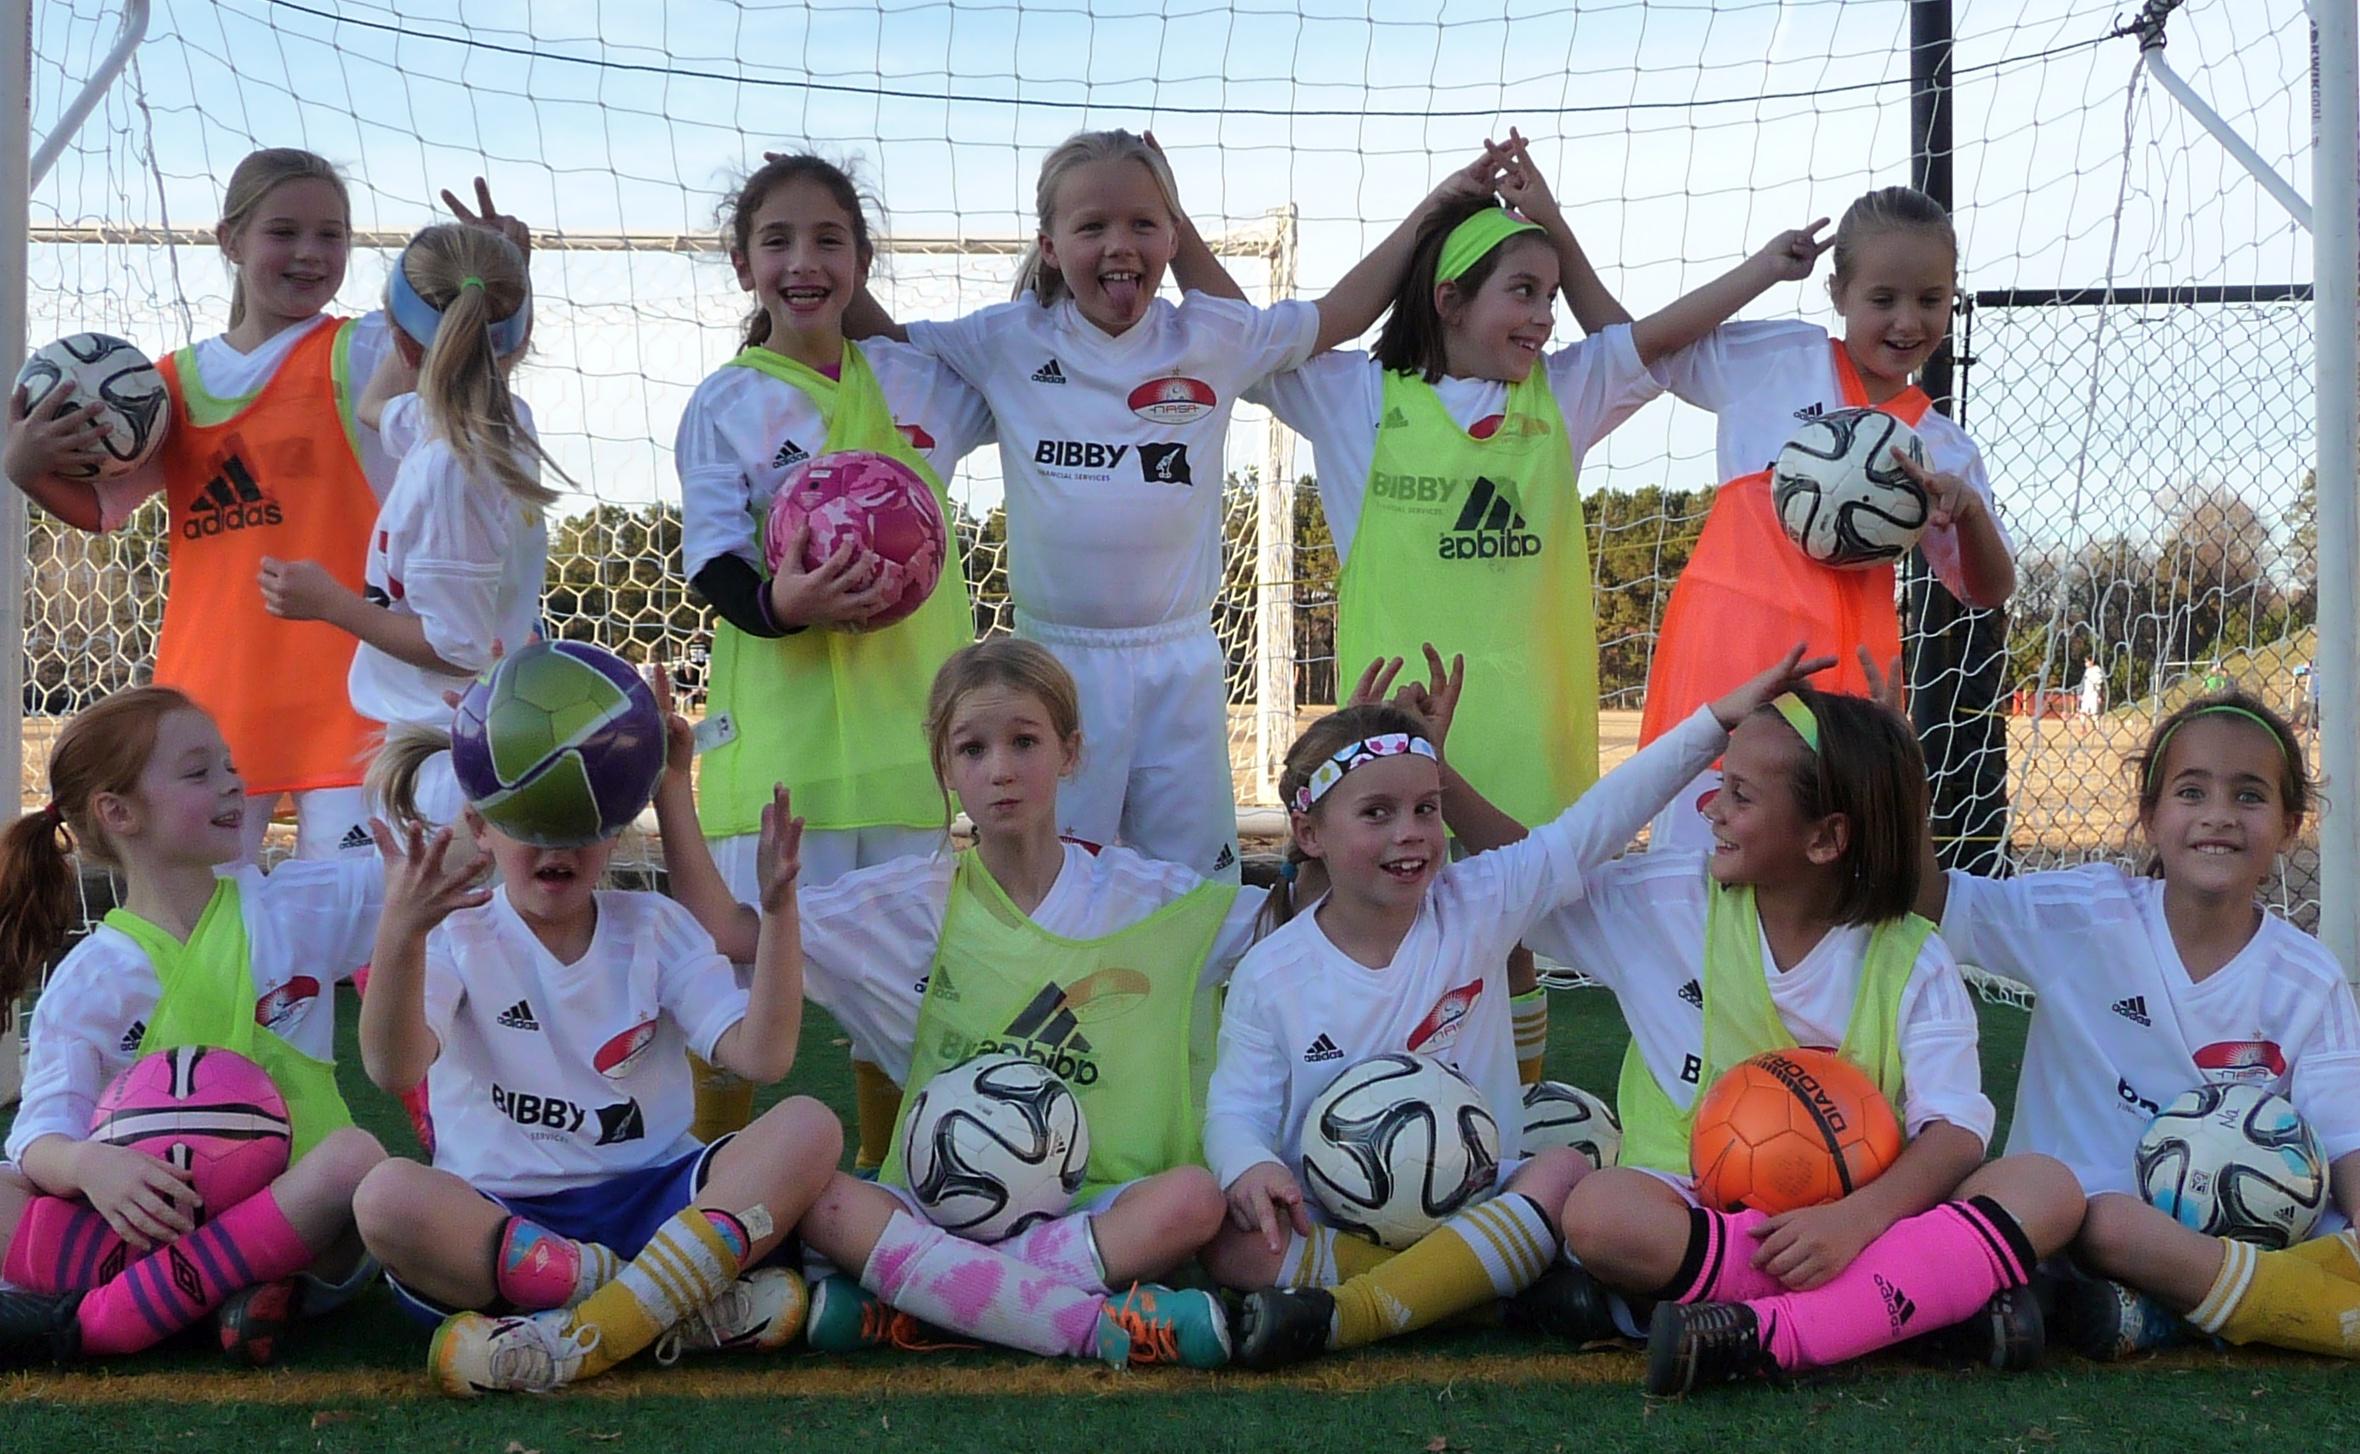 nasa soccer girls - photo #28